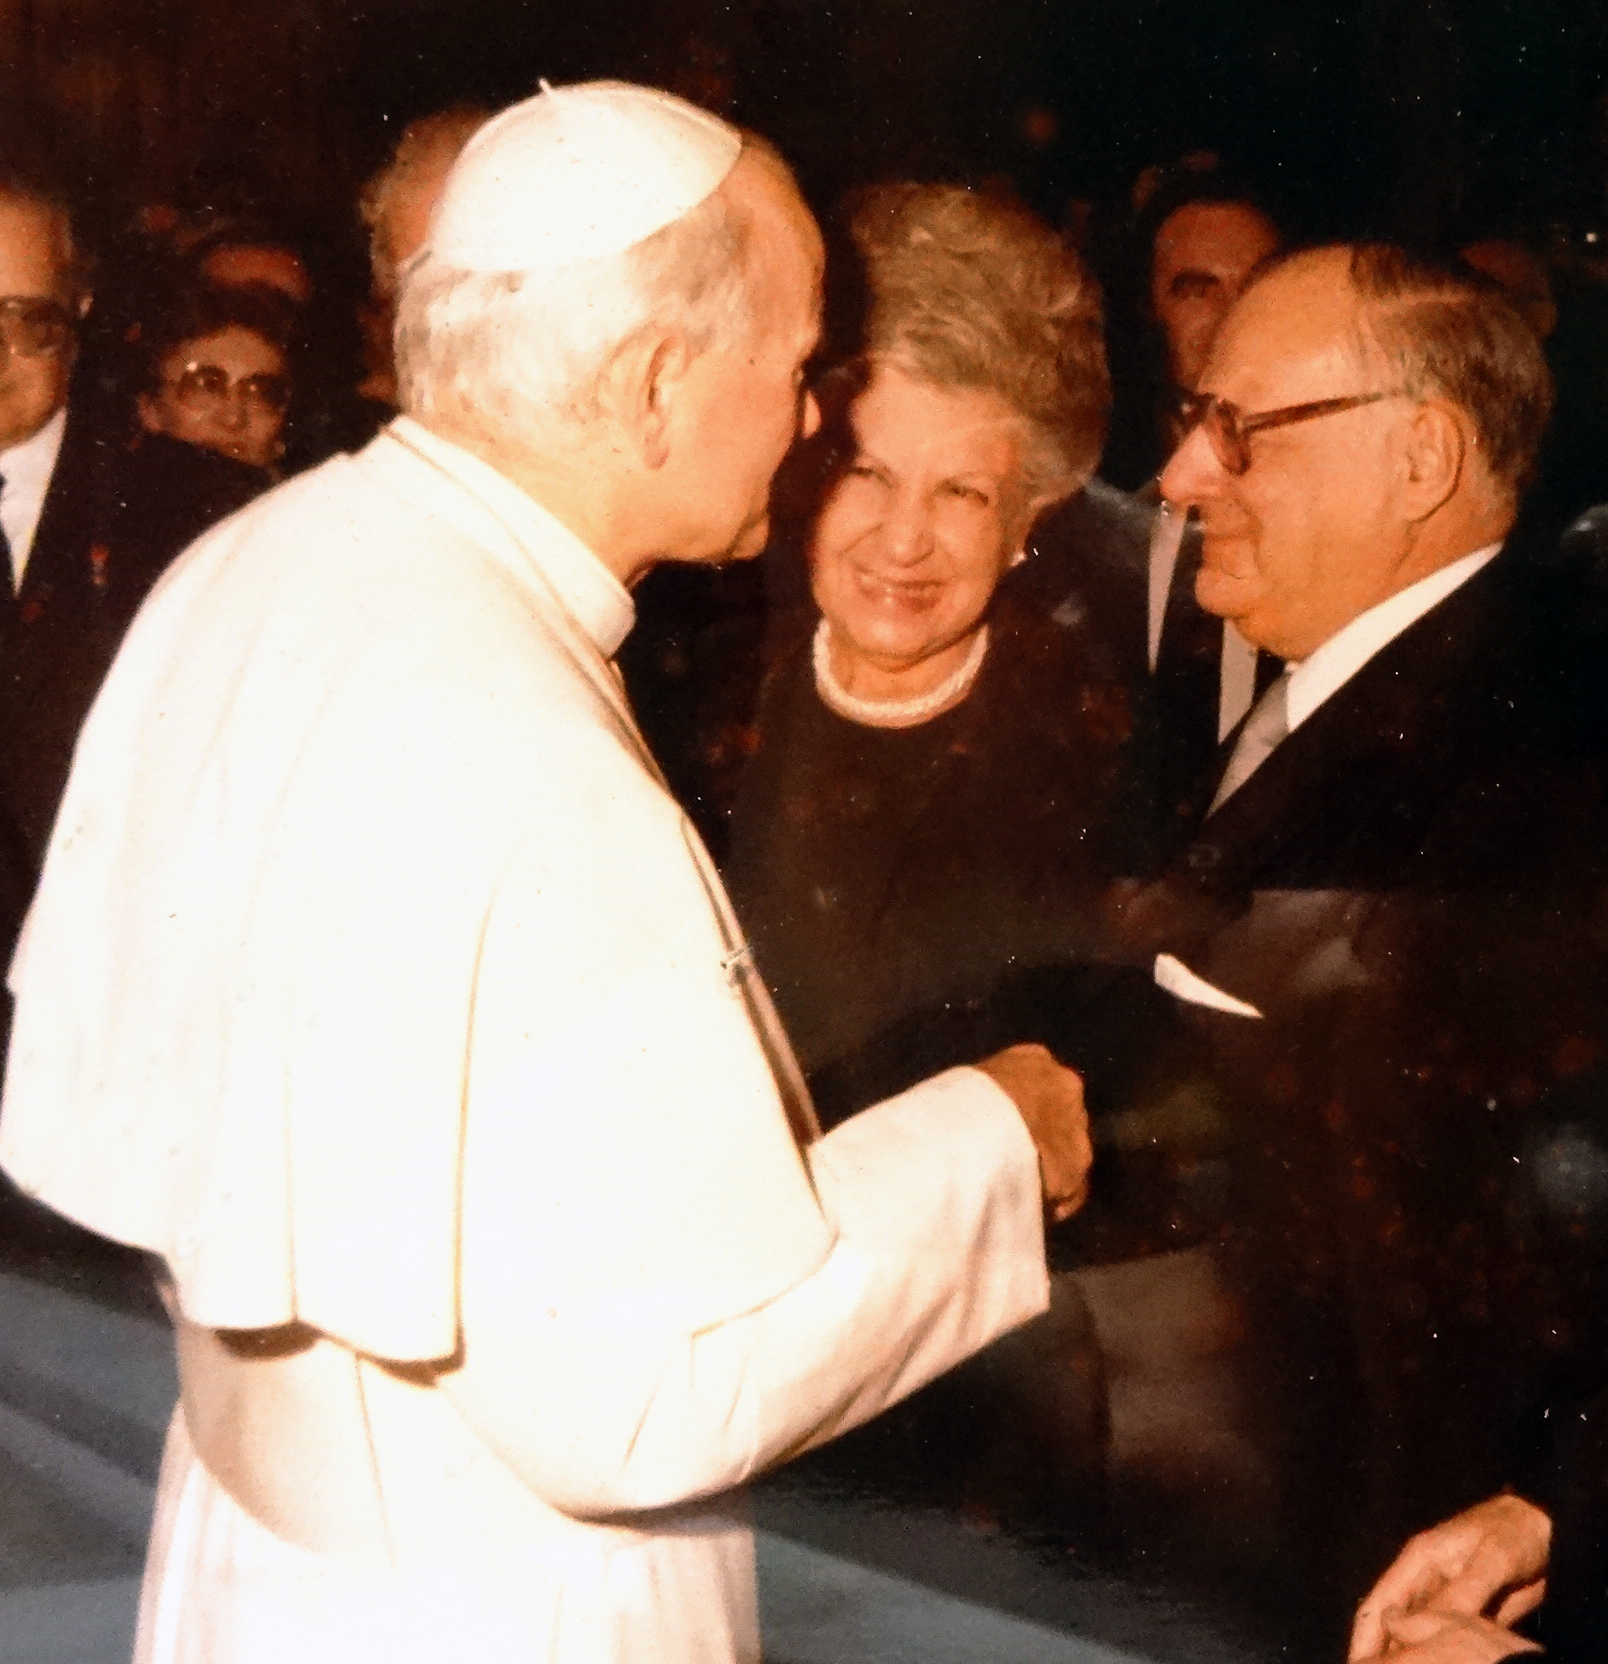 My Grandparents Dorothy and H.P Tasman with Pope John Paul II